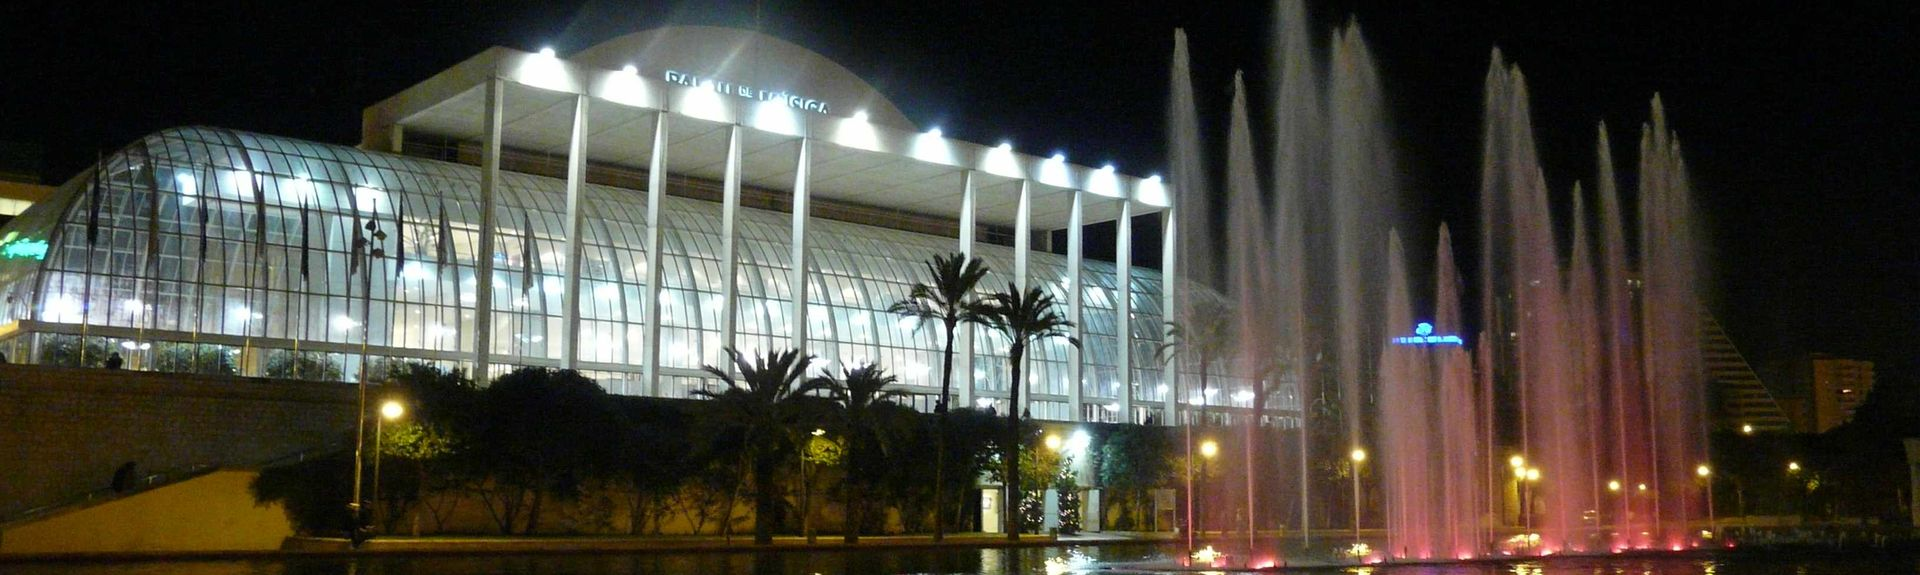 Albuixech, Comunidad Valenciana, España